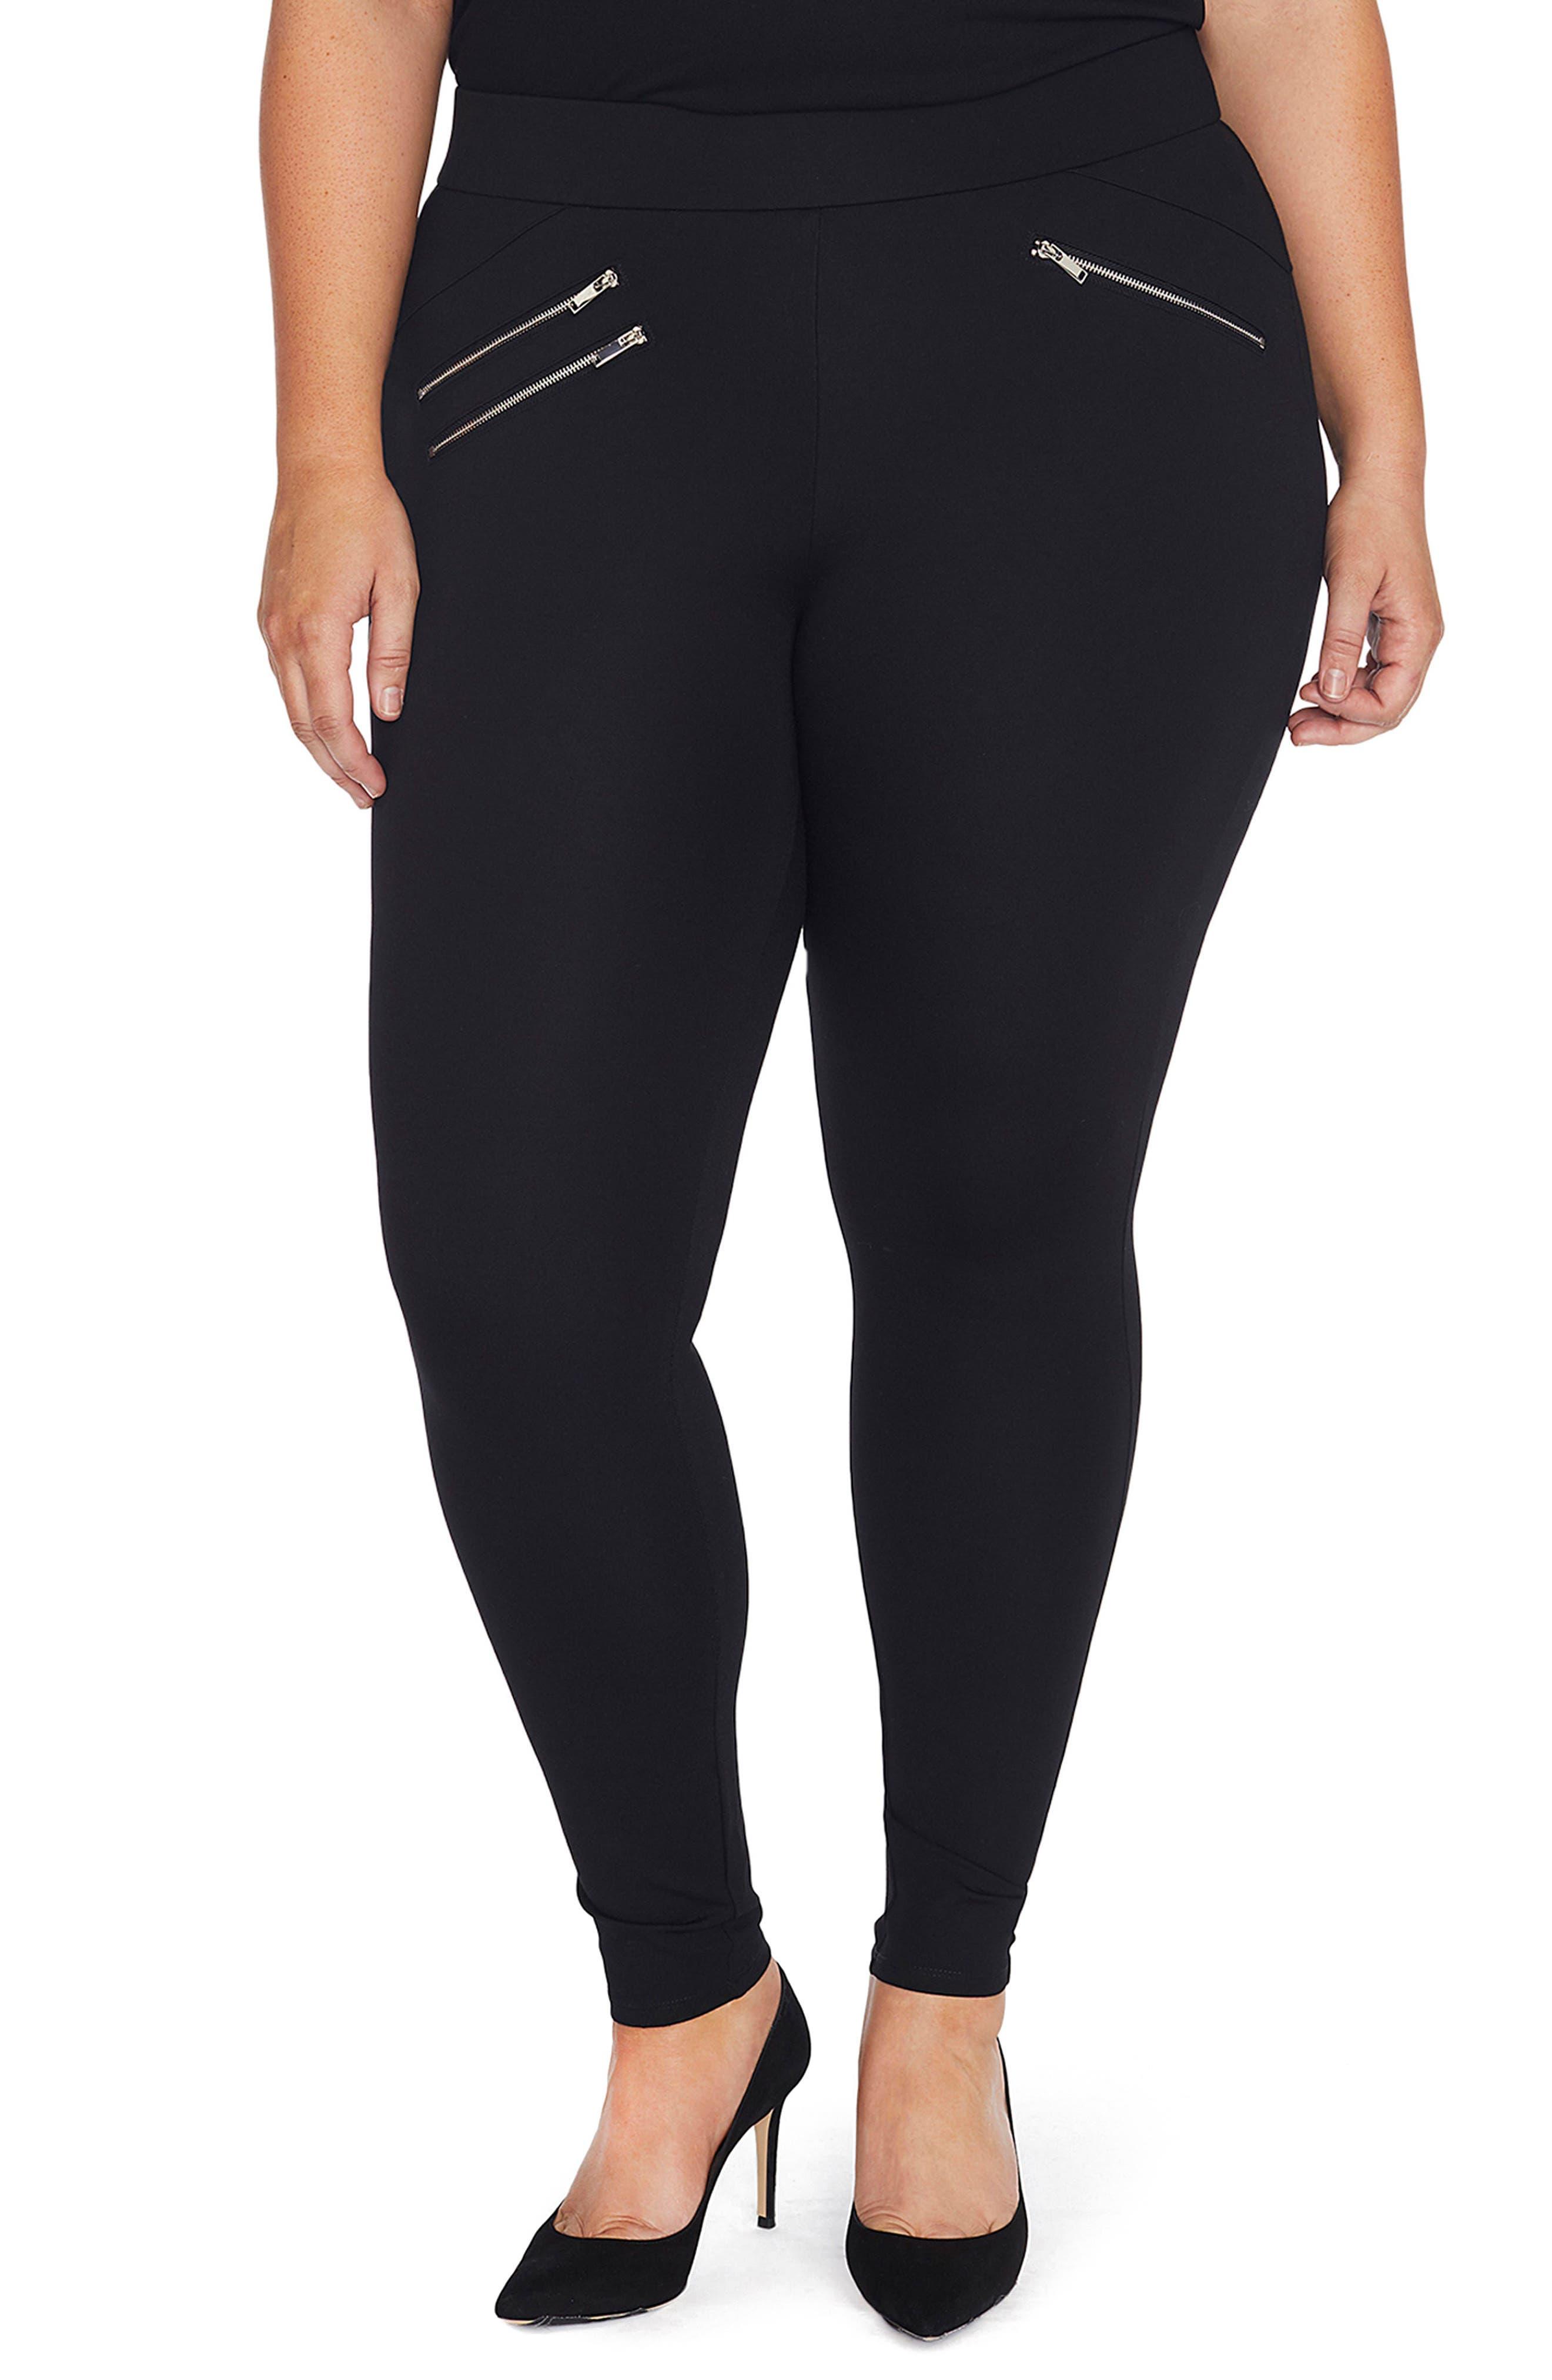 Main Image - REBEL WILSON X ANGELS Body Lift Skinny Leggings (Plus Size)